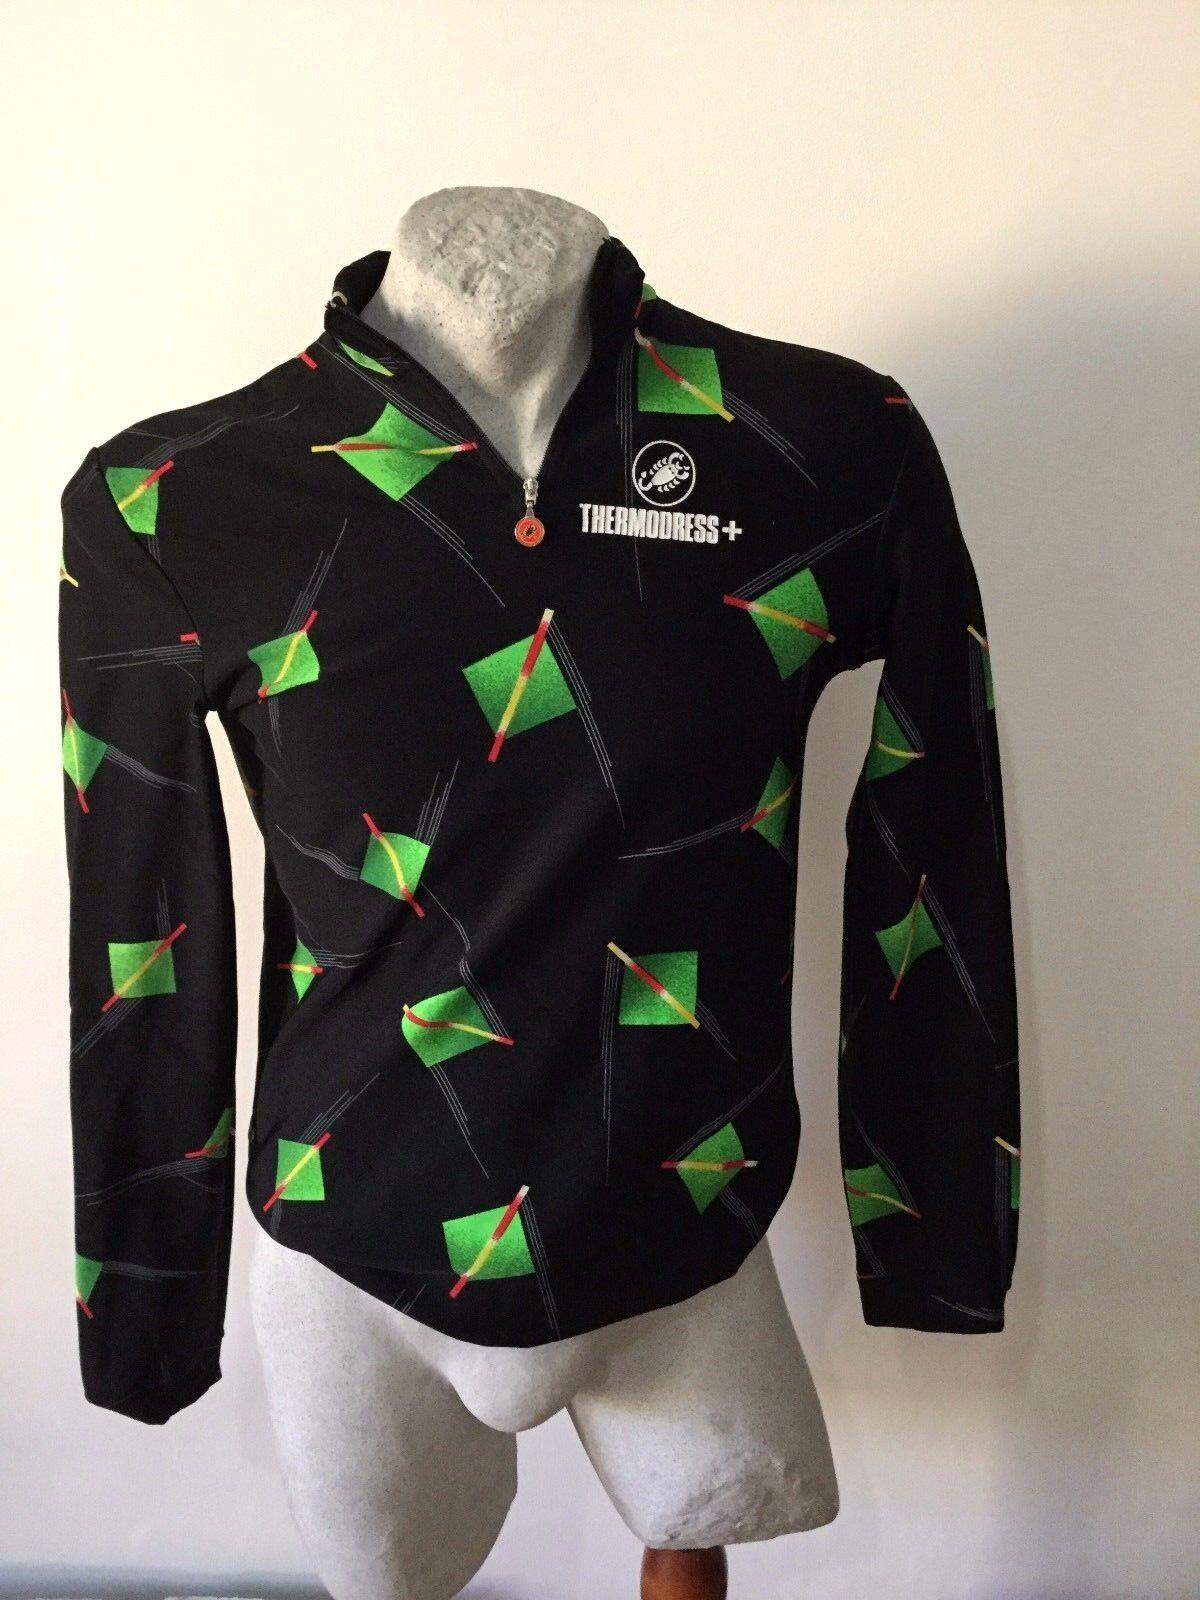 Cycling  Jersey Castelli  Cycling Jersey Trikot Shirt THERMODRESS Vintage  online sales